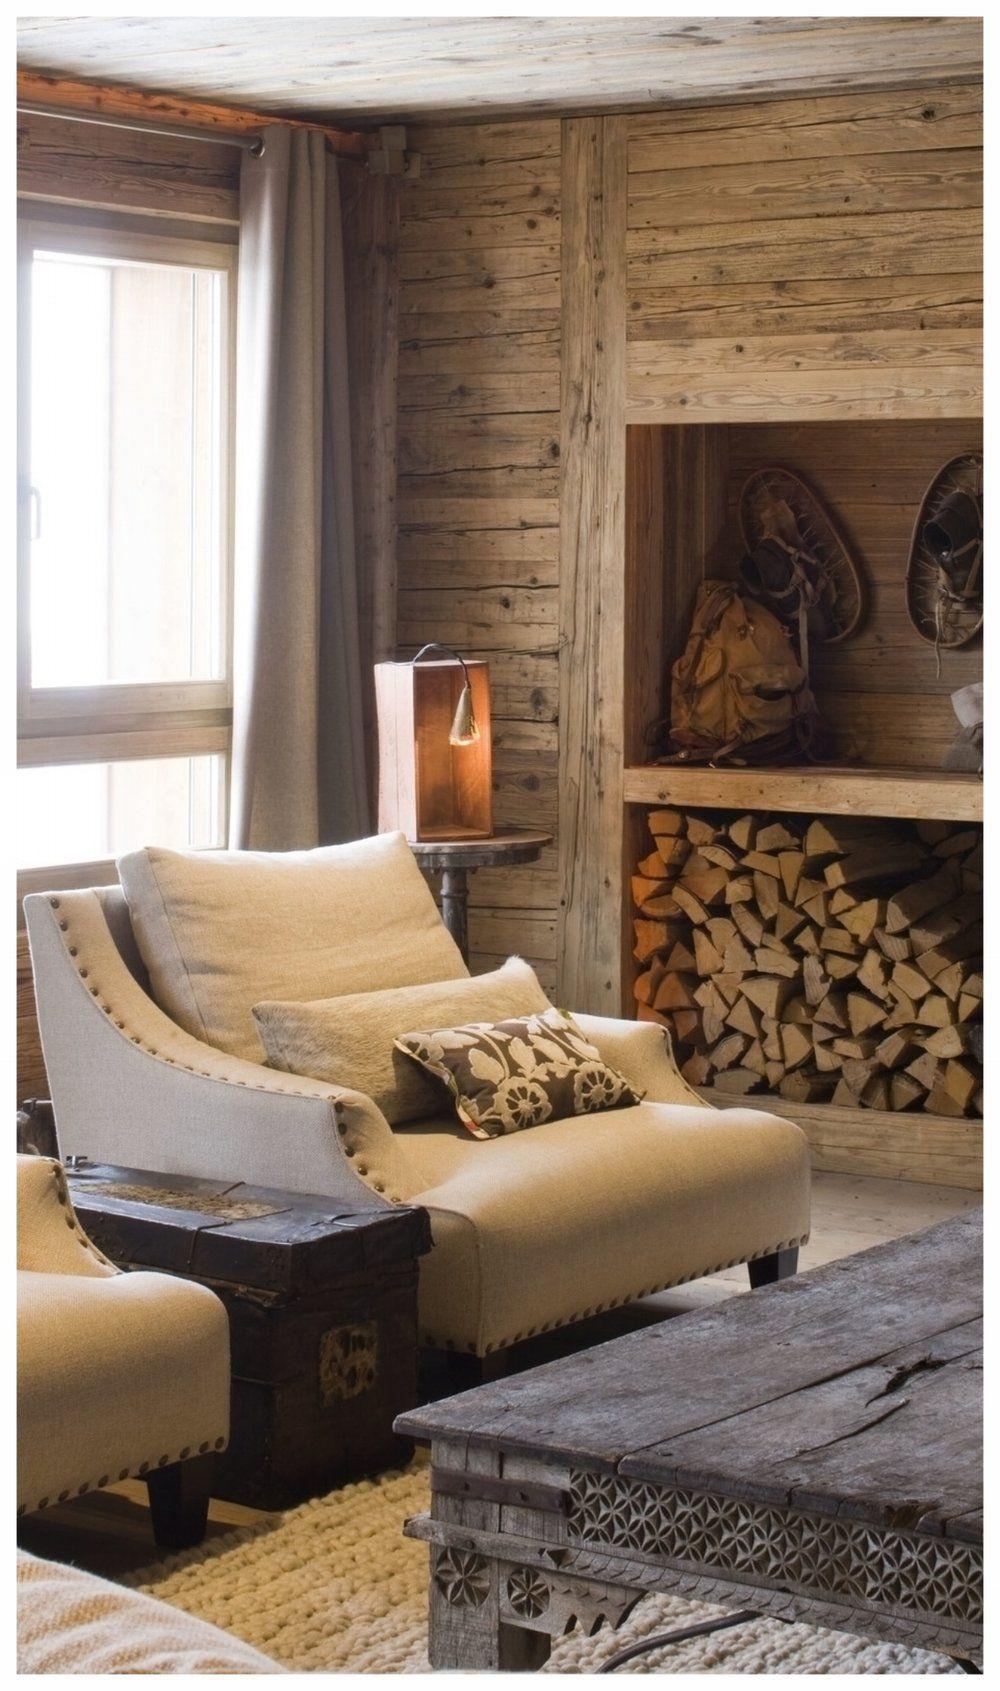 Rustic Log Homes Pinterest Crackpot Baby Rusticfurniture Interior Design Living Room Interior Design Living Room Interior